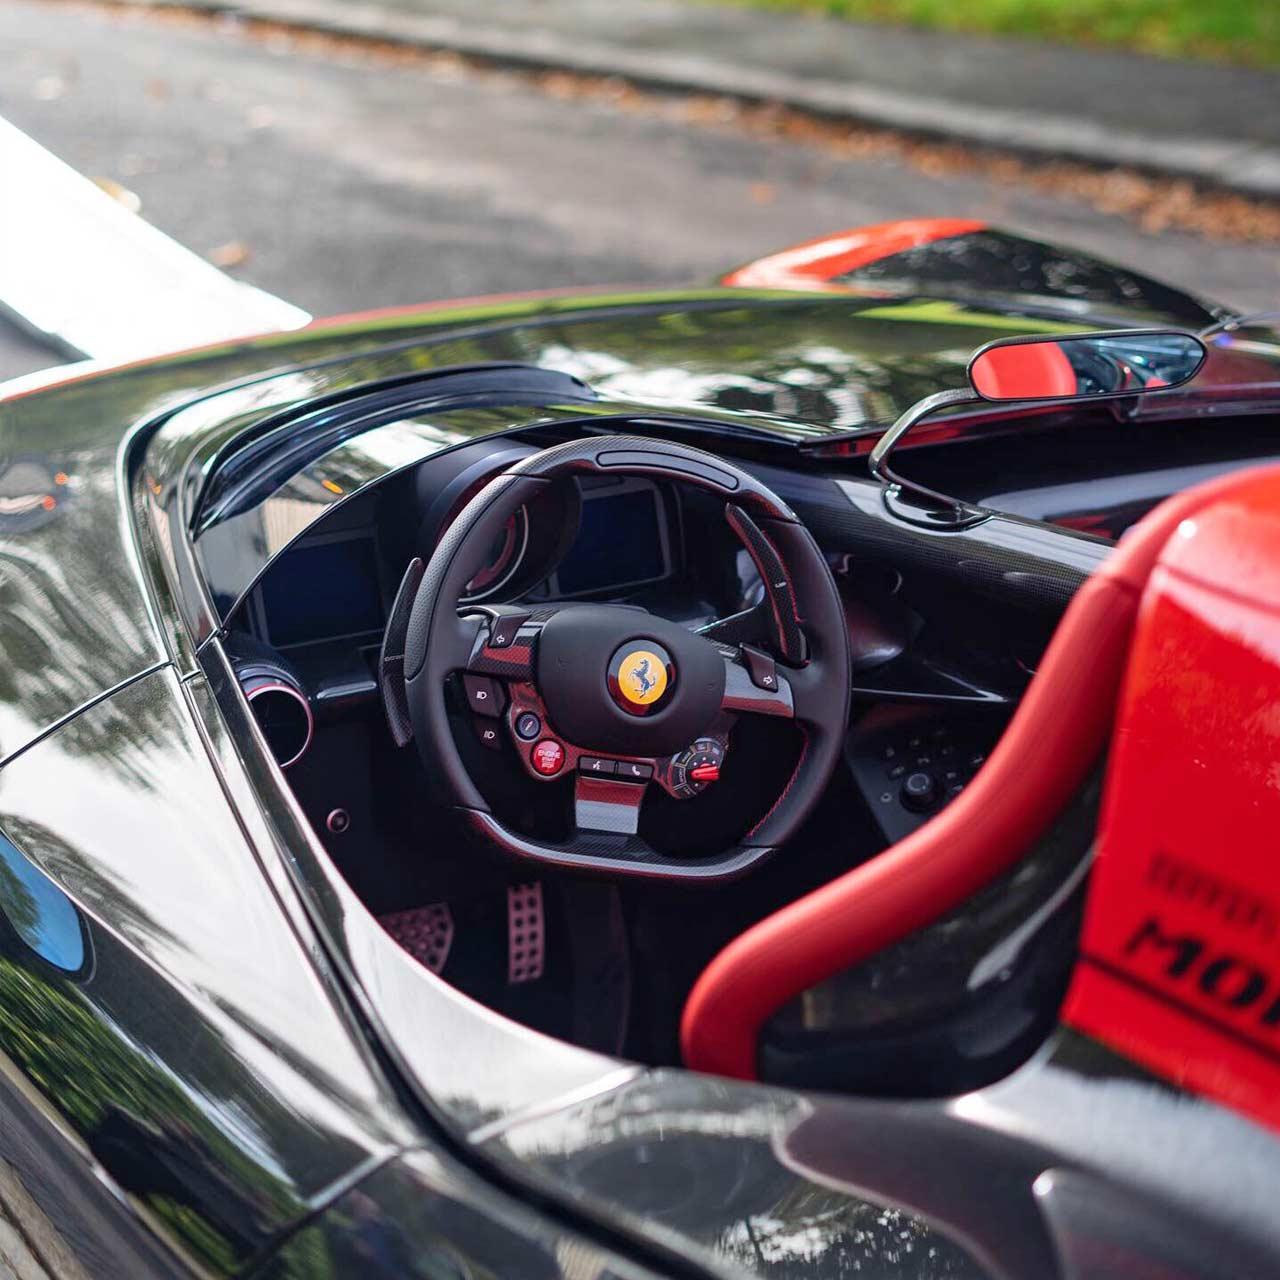 F8 Tributo Interior: Gordon Ramsay's Ferrari Monza SP2 Looks Stunning